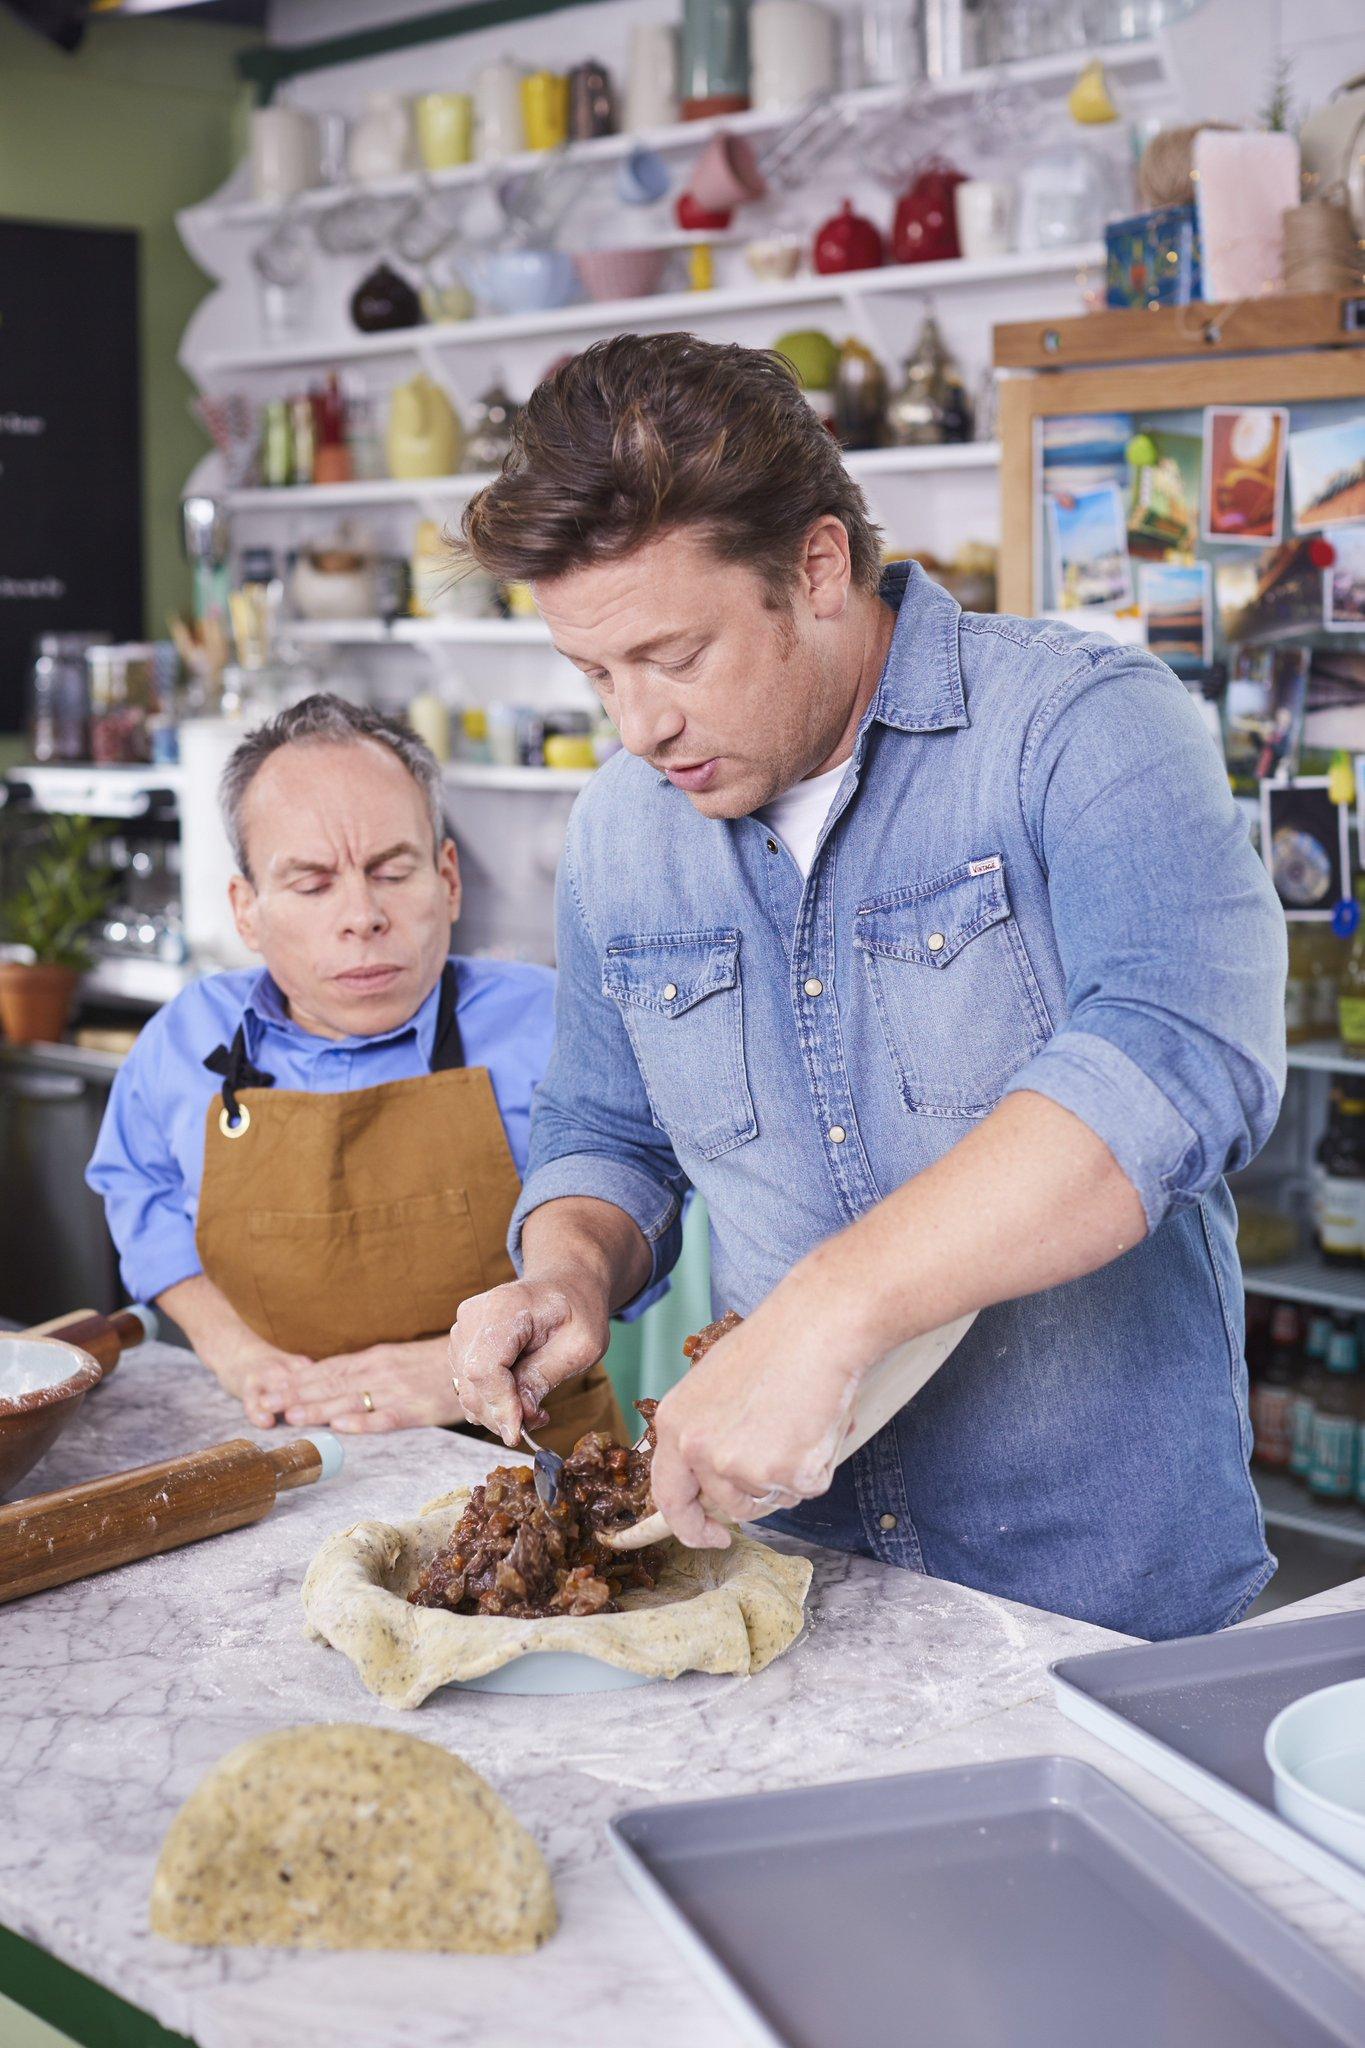 .@WarwickADavis and the (Half-Blood) Chef! #FridayNightFeast, this Friday, 8pm on @Channel4. https://t.co/W0CVylFd8K